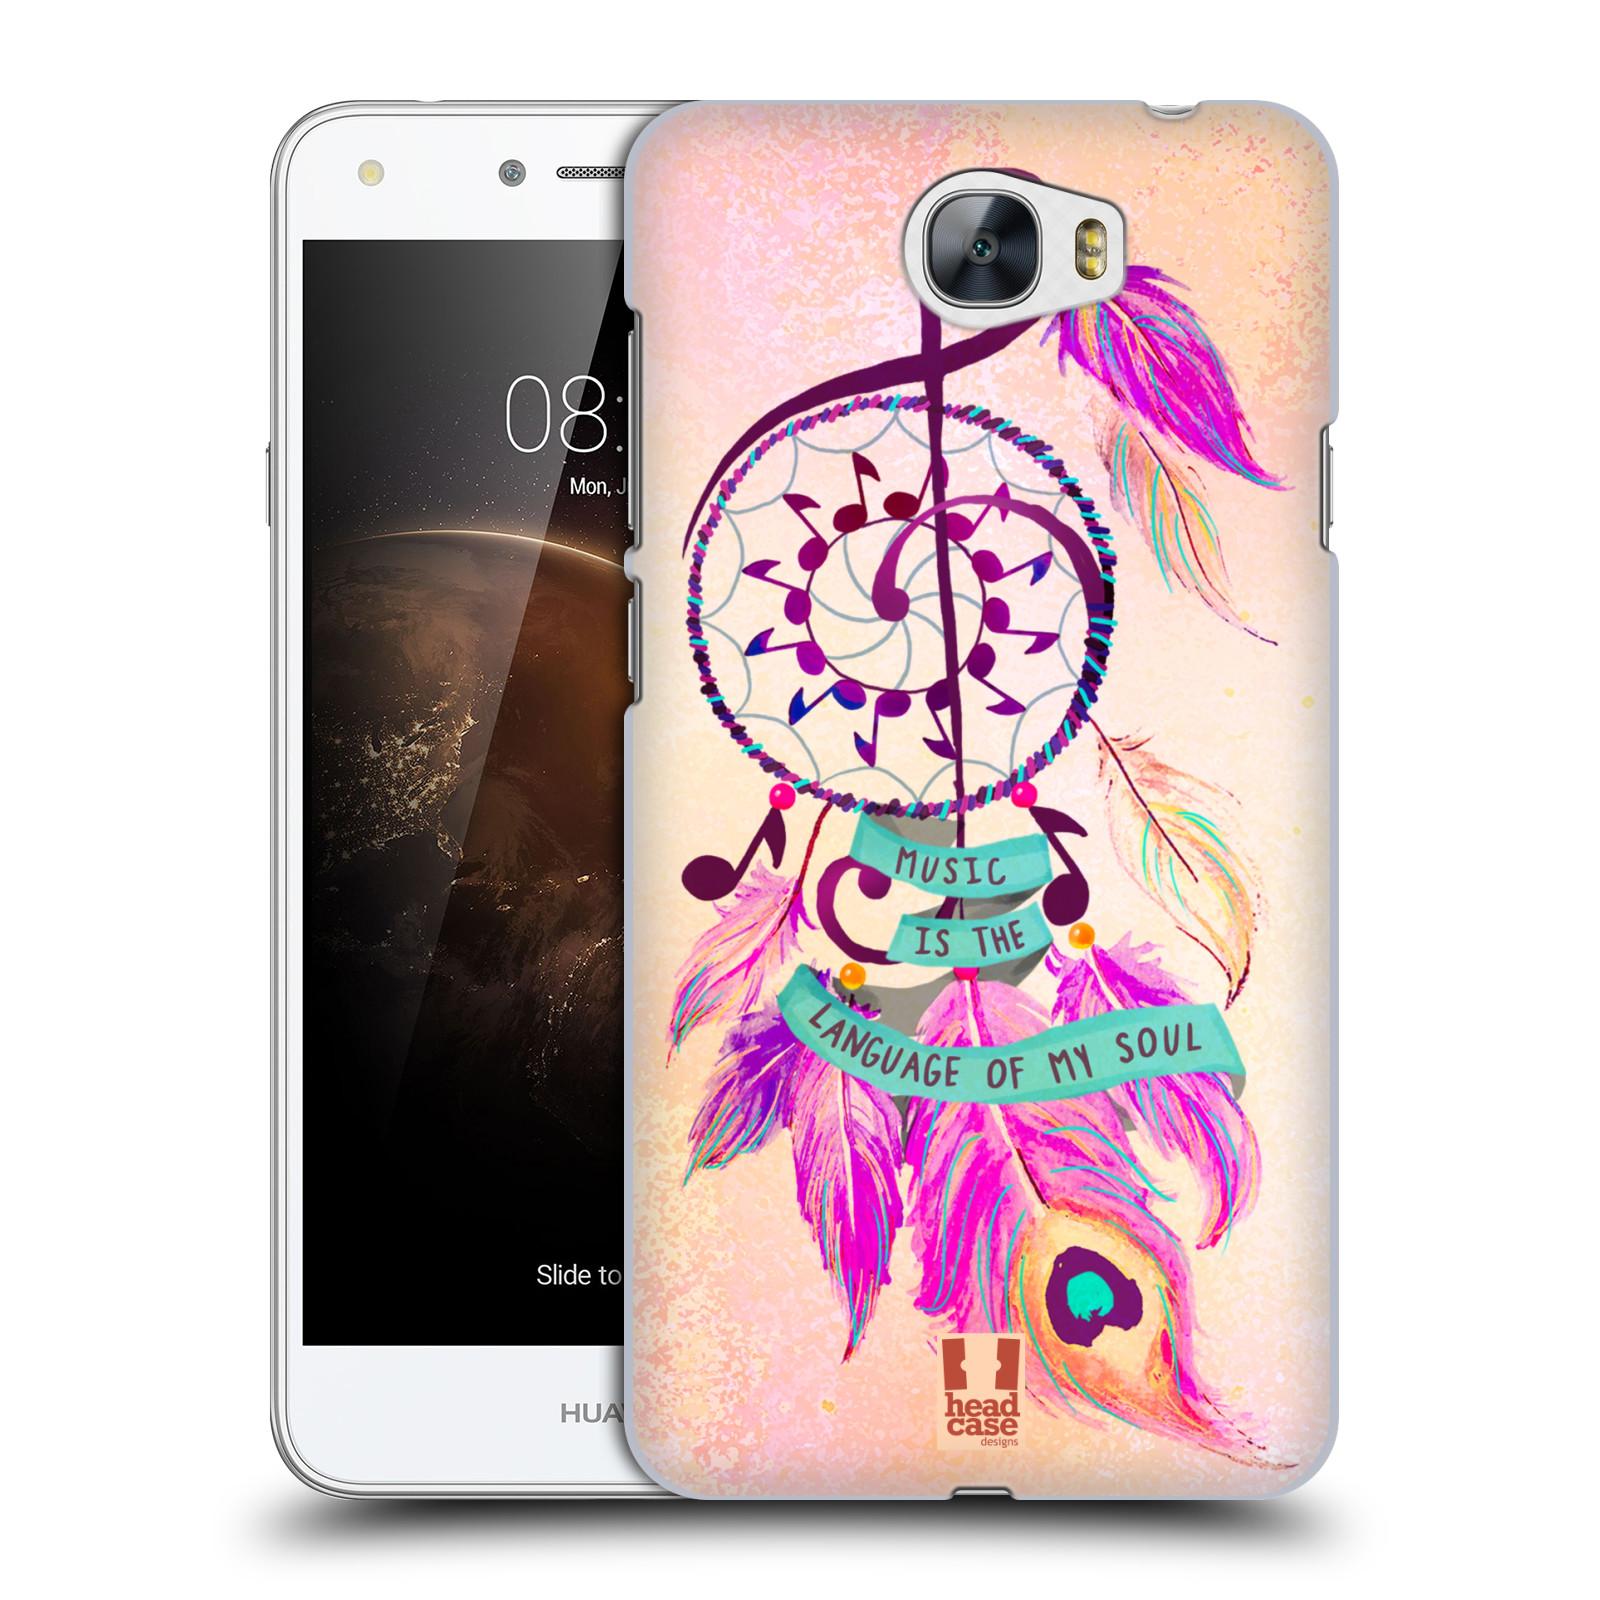 Plastové pouzdro na mobil Huawei Y5 II HEAD CASE Lapač Assorted Music